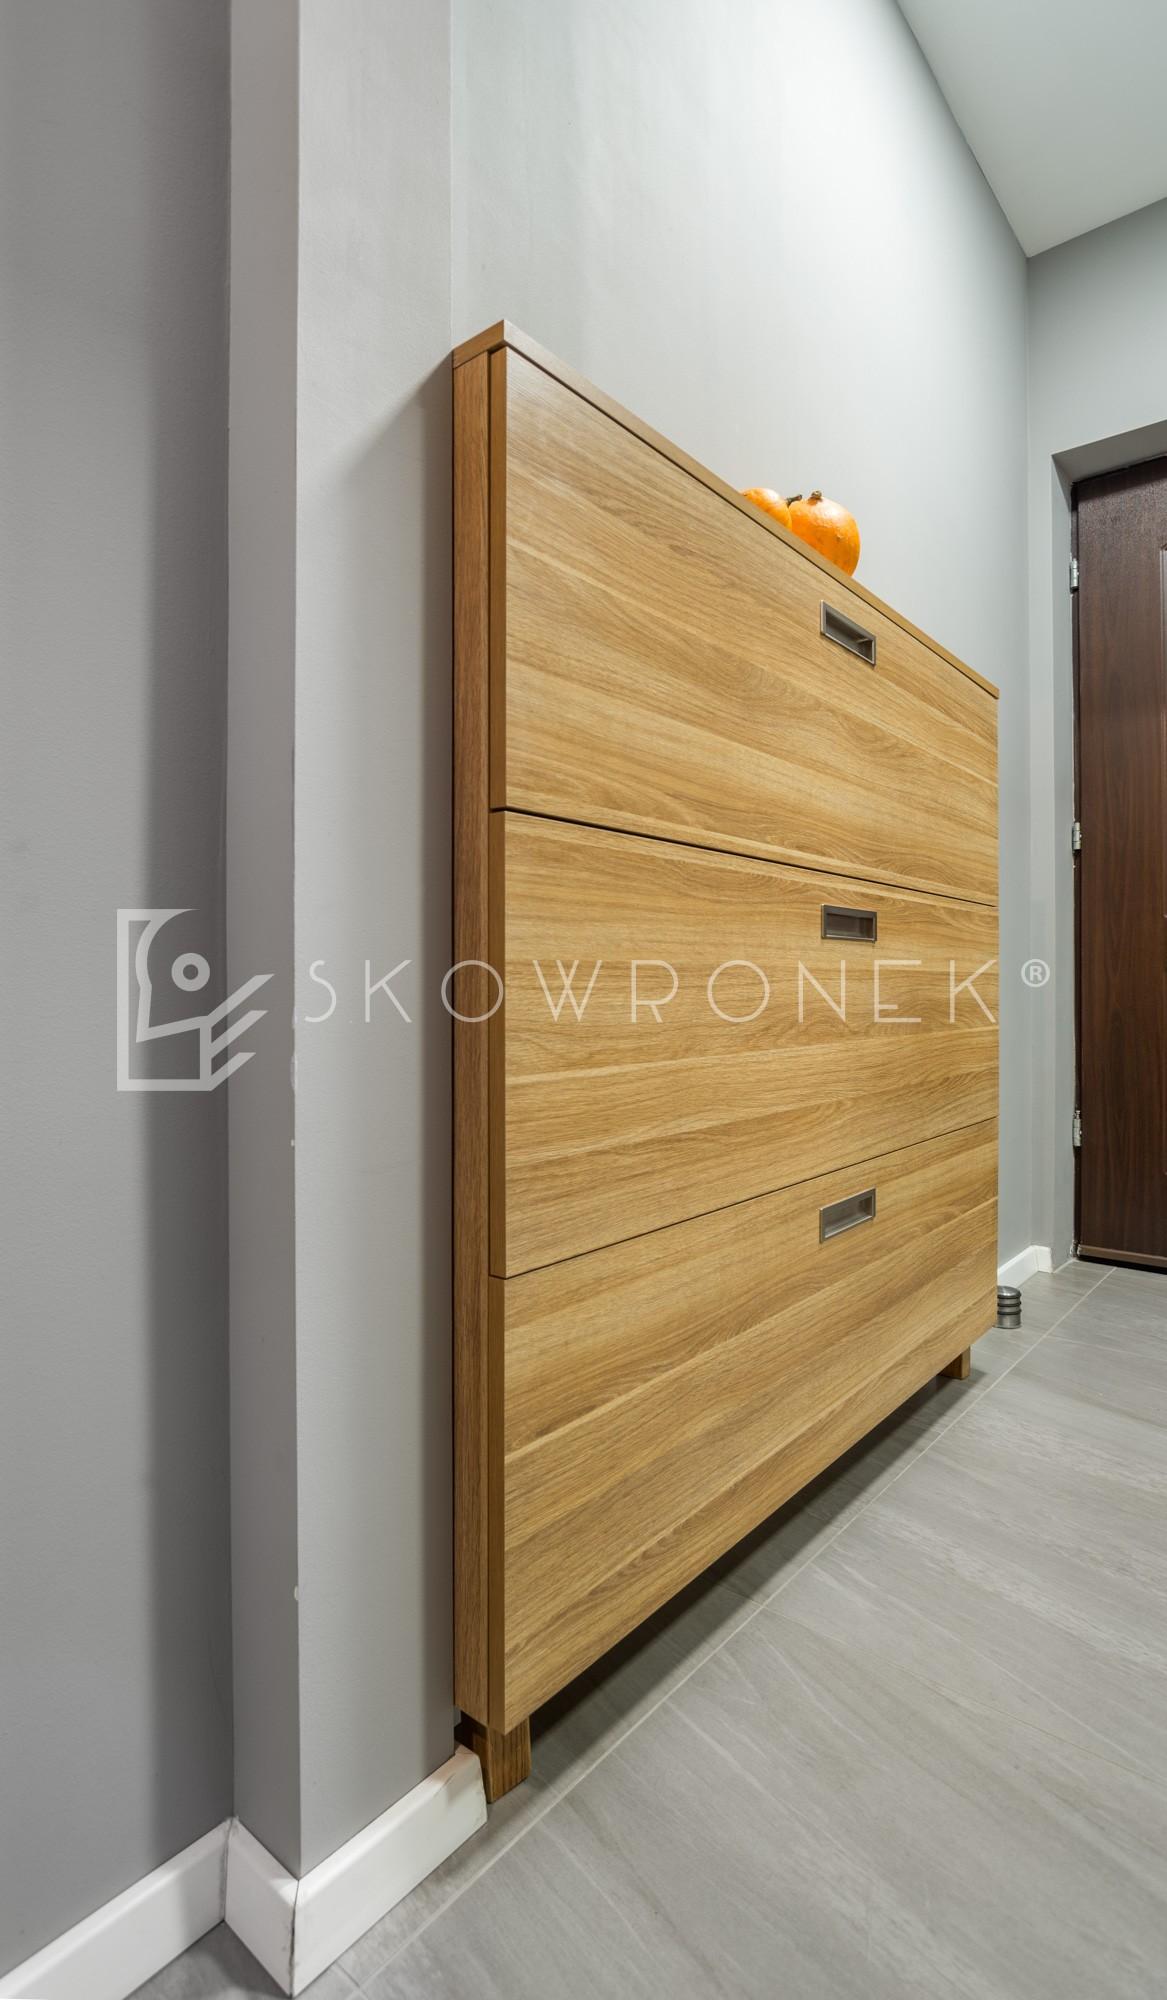 SKO_3046